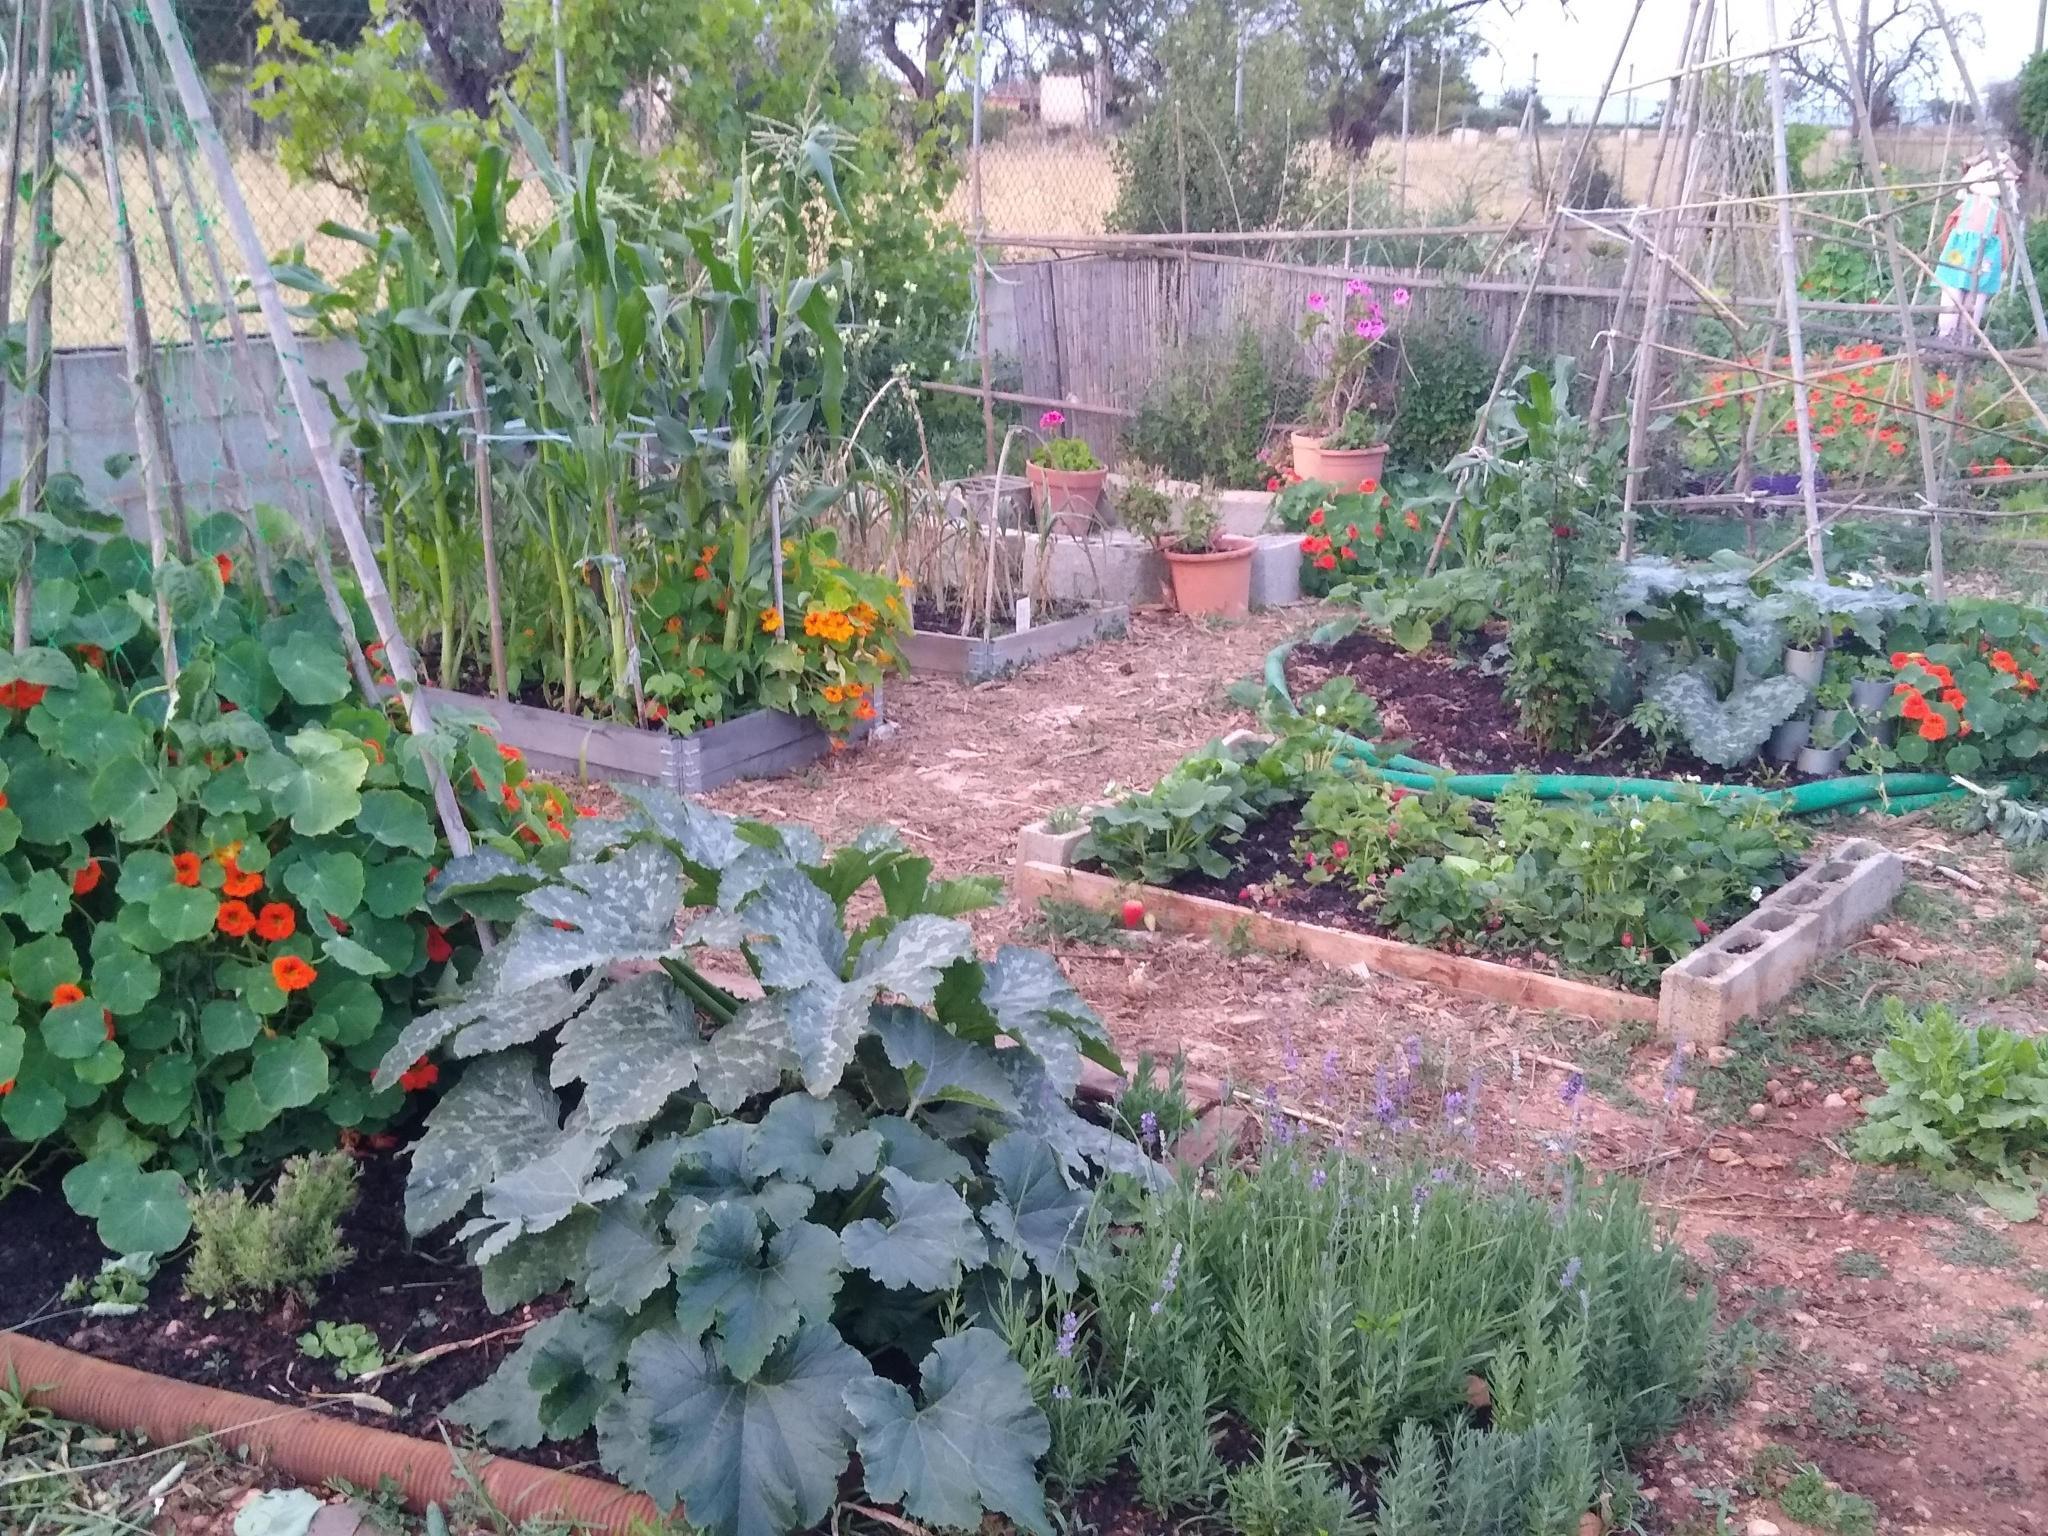 Part of the garden now